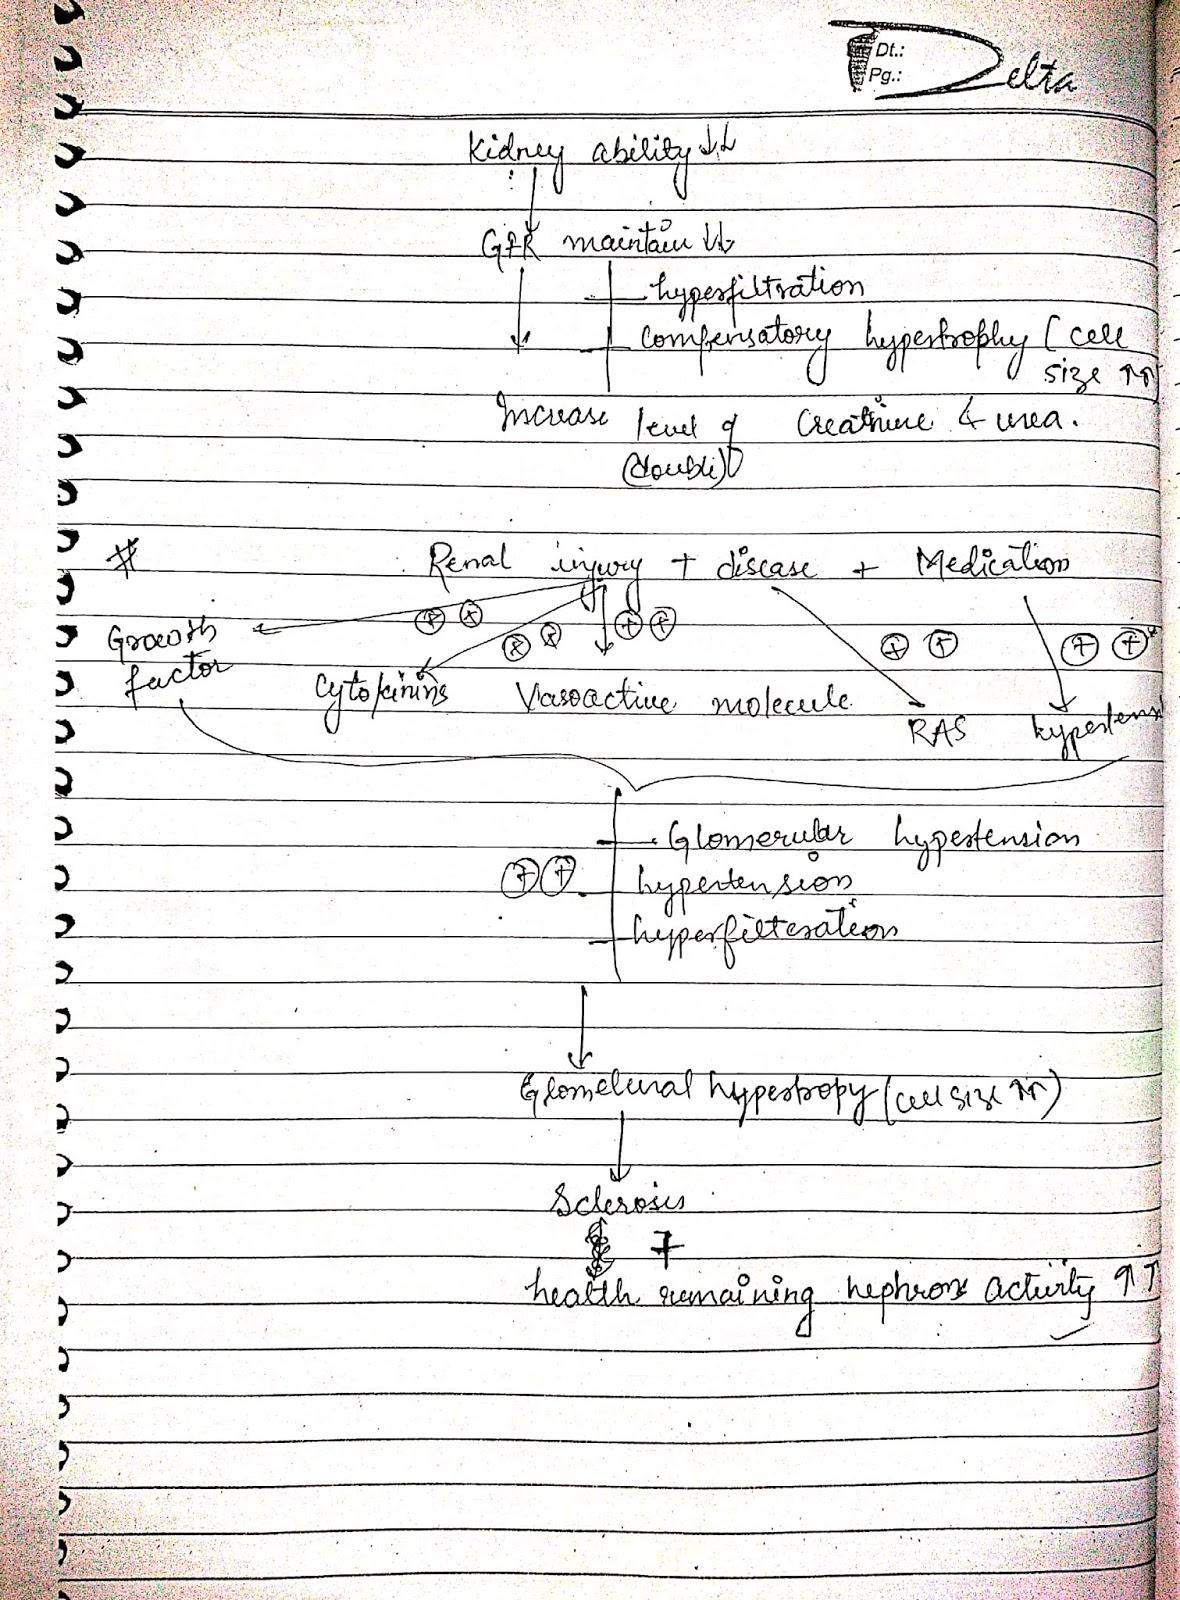 pathophysiology - renal disorder chronic renal failure